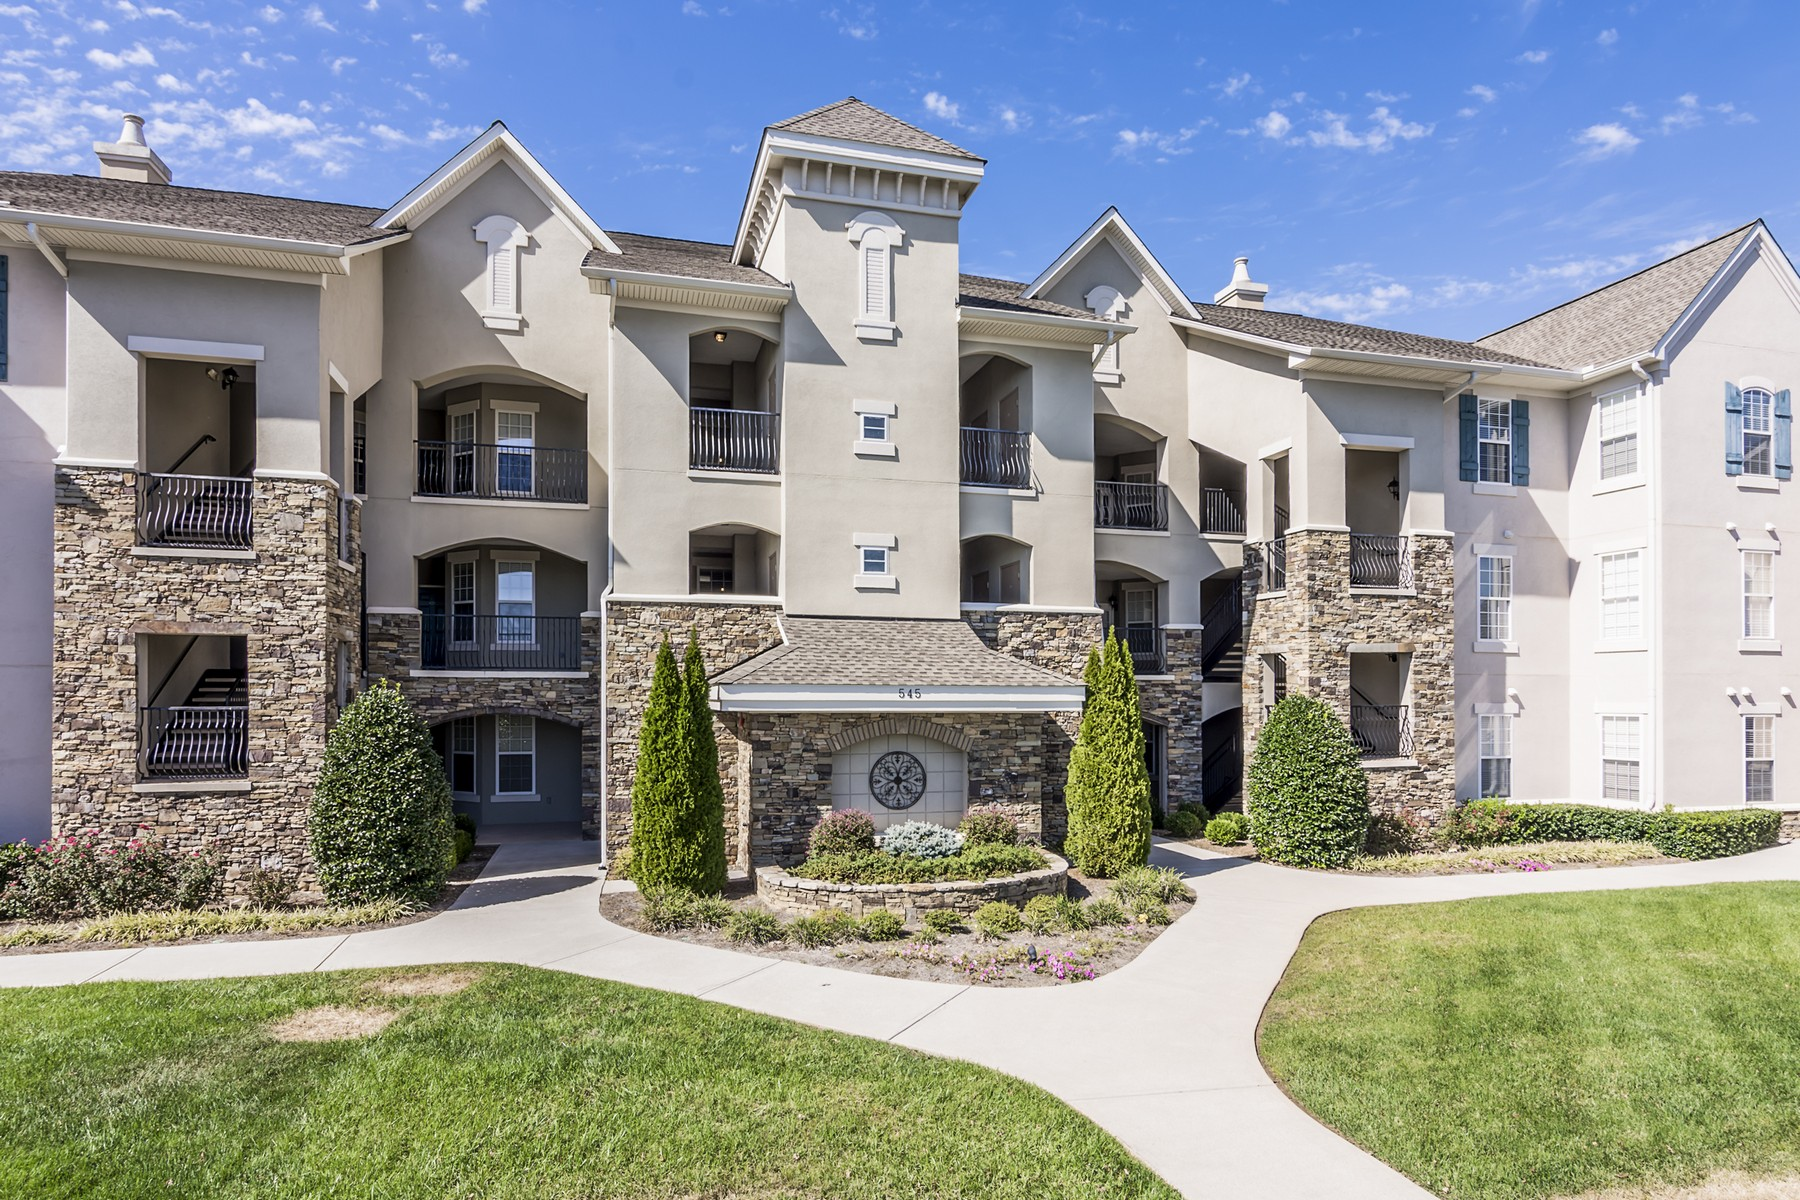 Condominium for Sale at Rarity Bay Condominium 545 Rarity Bay Parkway Unit #106 Vonore, Tennessee, 37885 United States